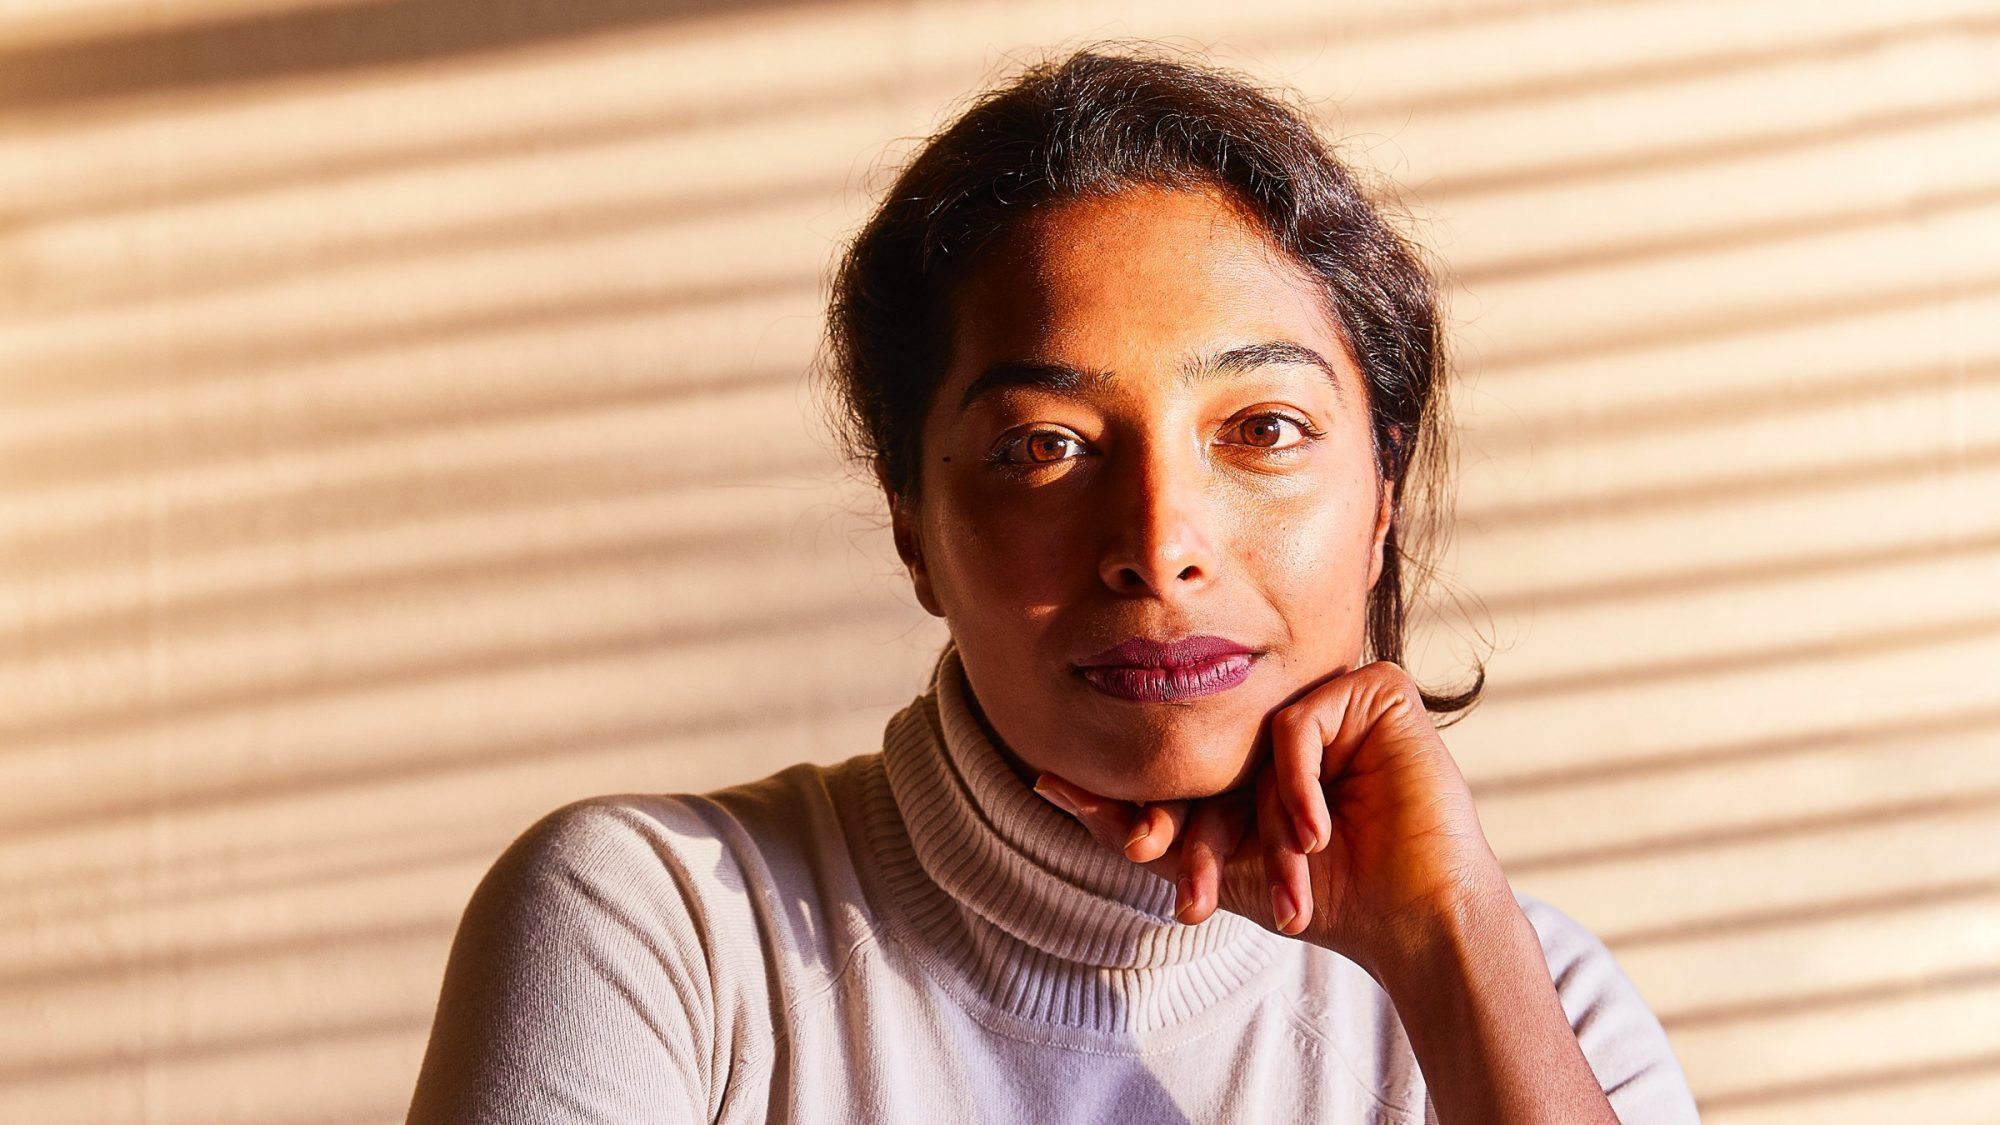 Mumbai-born entrepreneur, Sana Javeri Kadri founded her company at the age of 23.